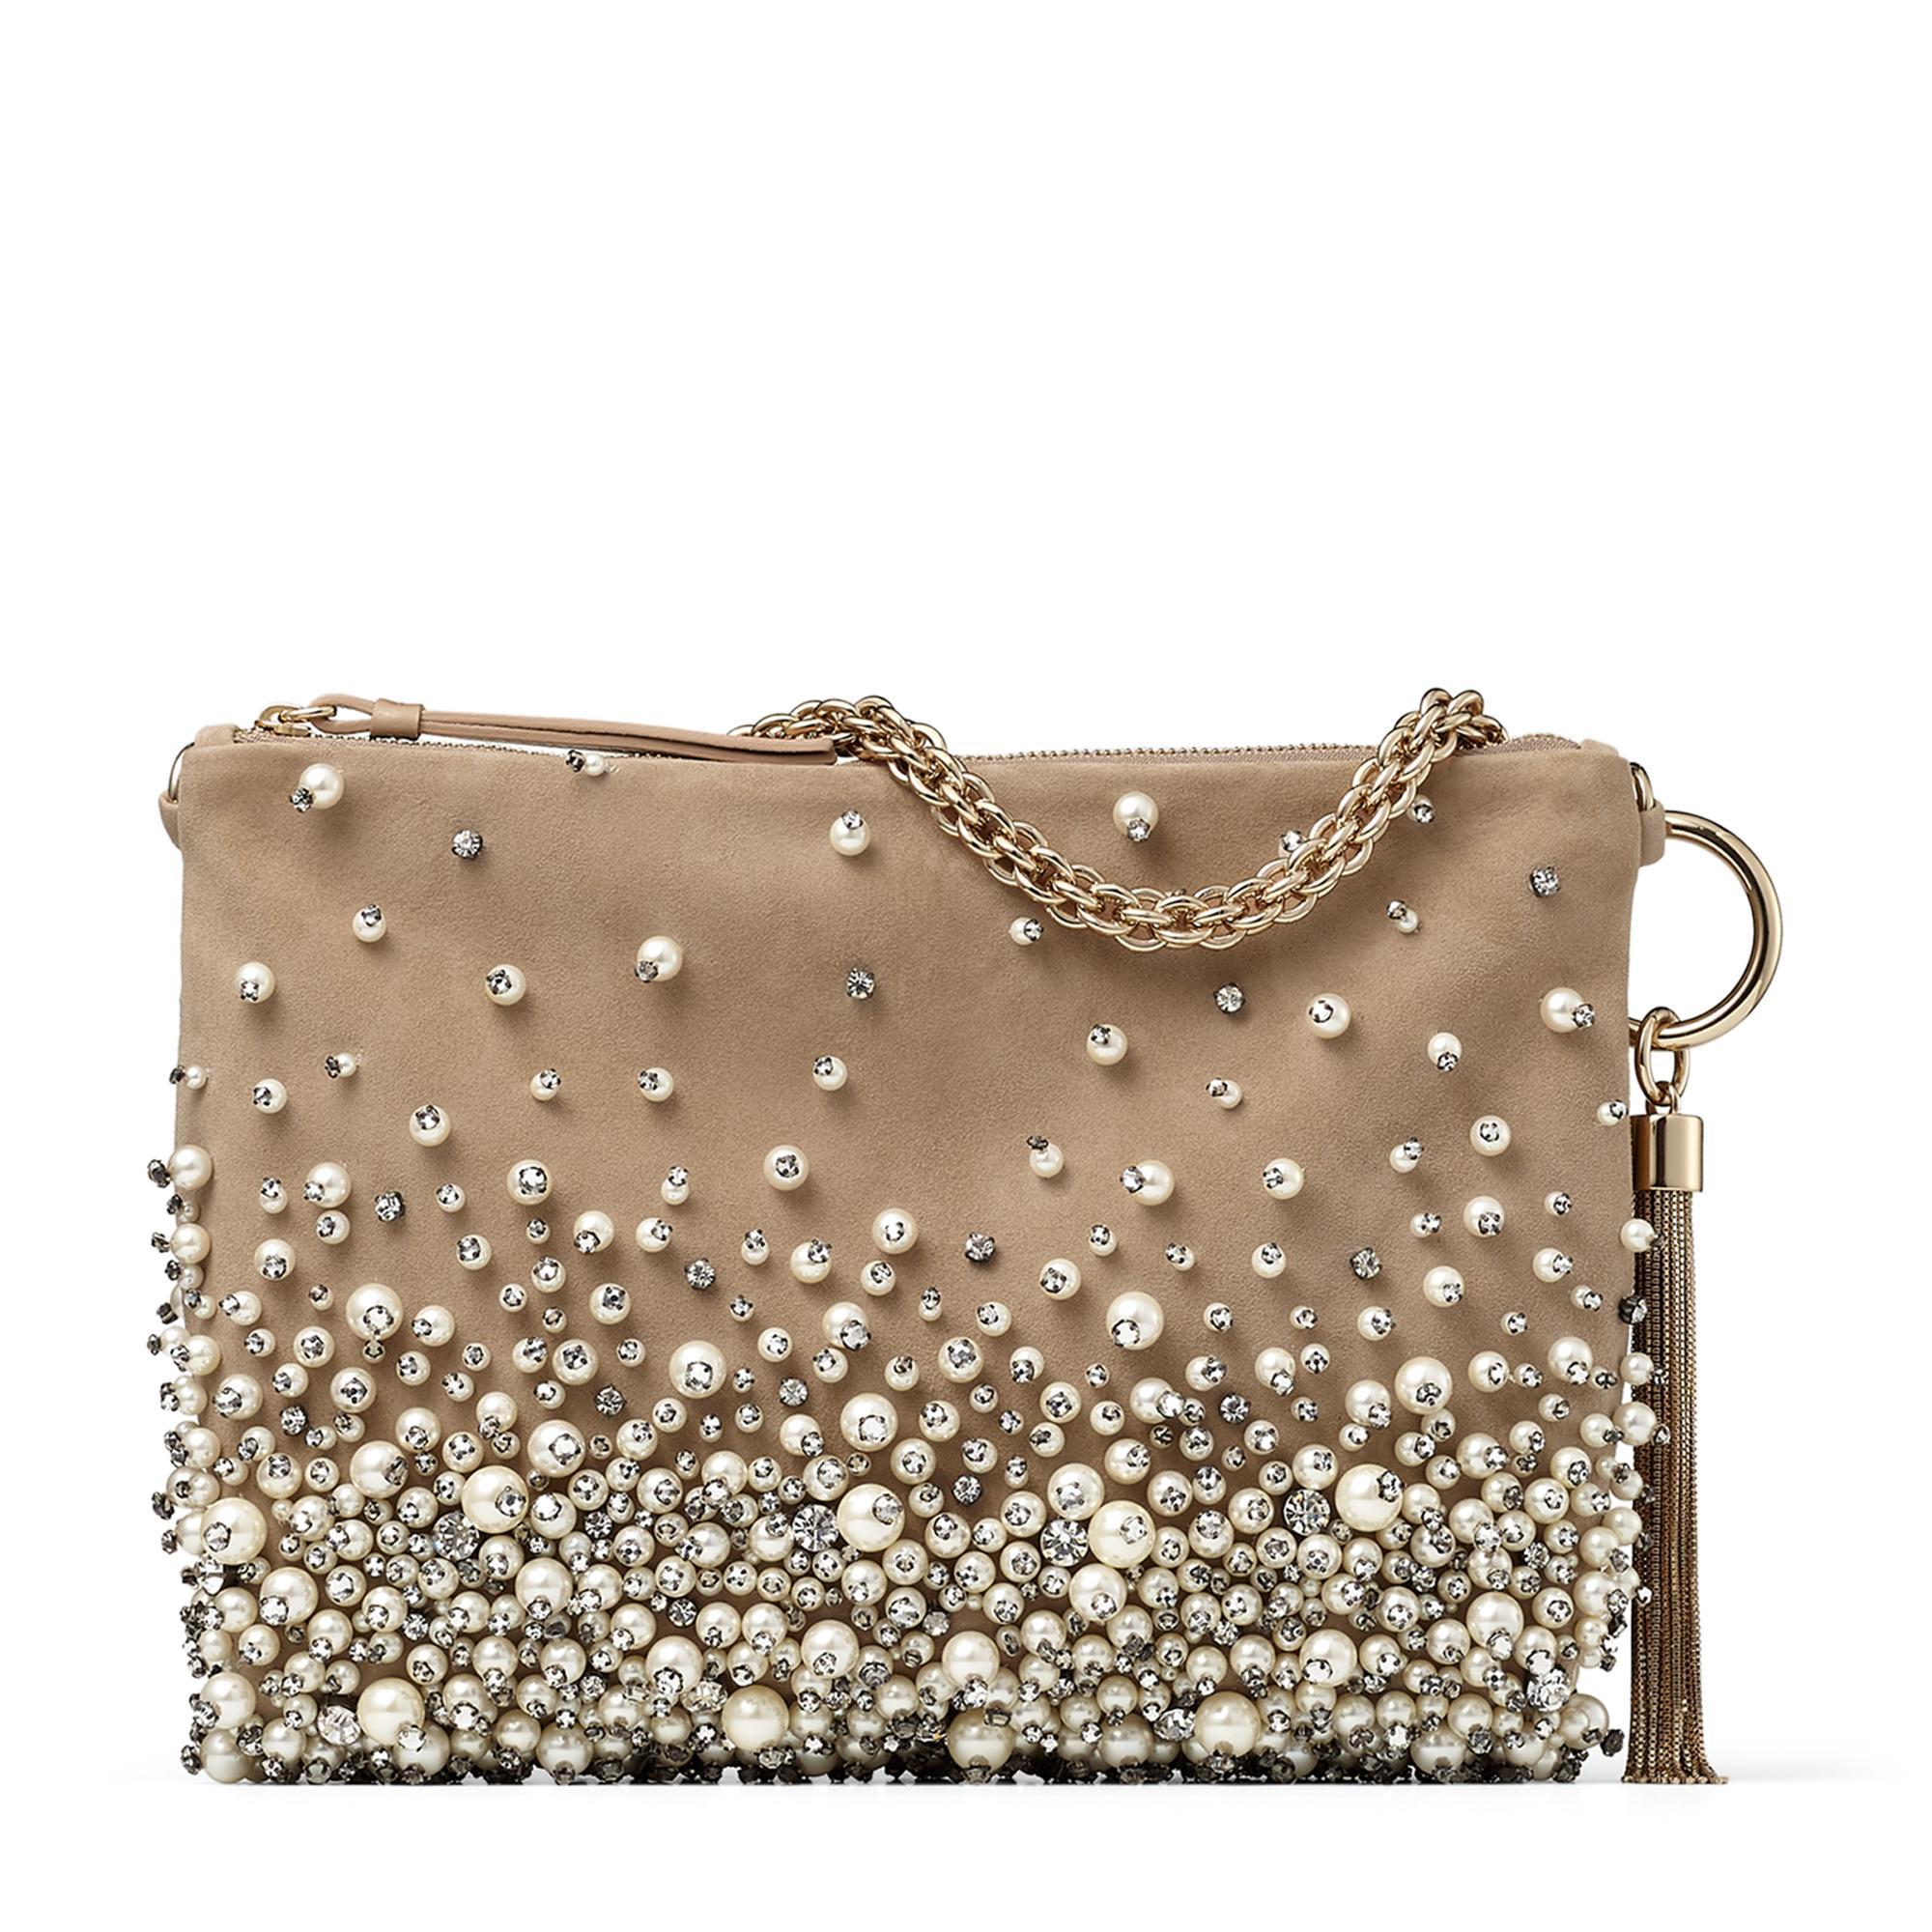 Callie bag